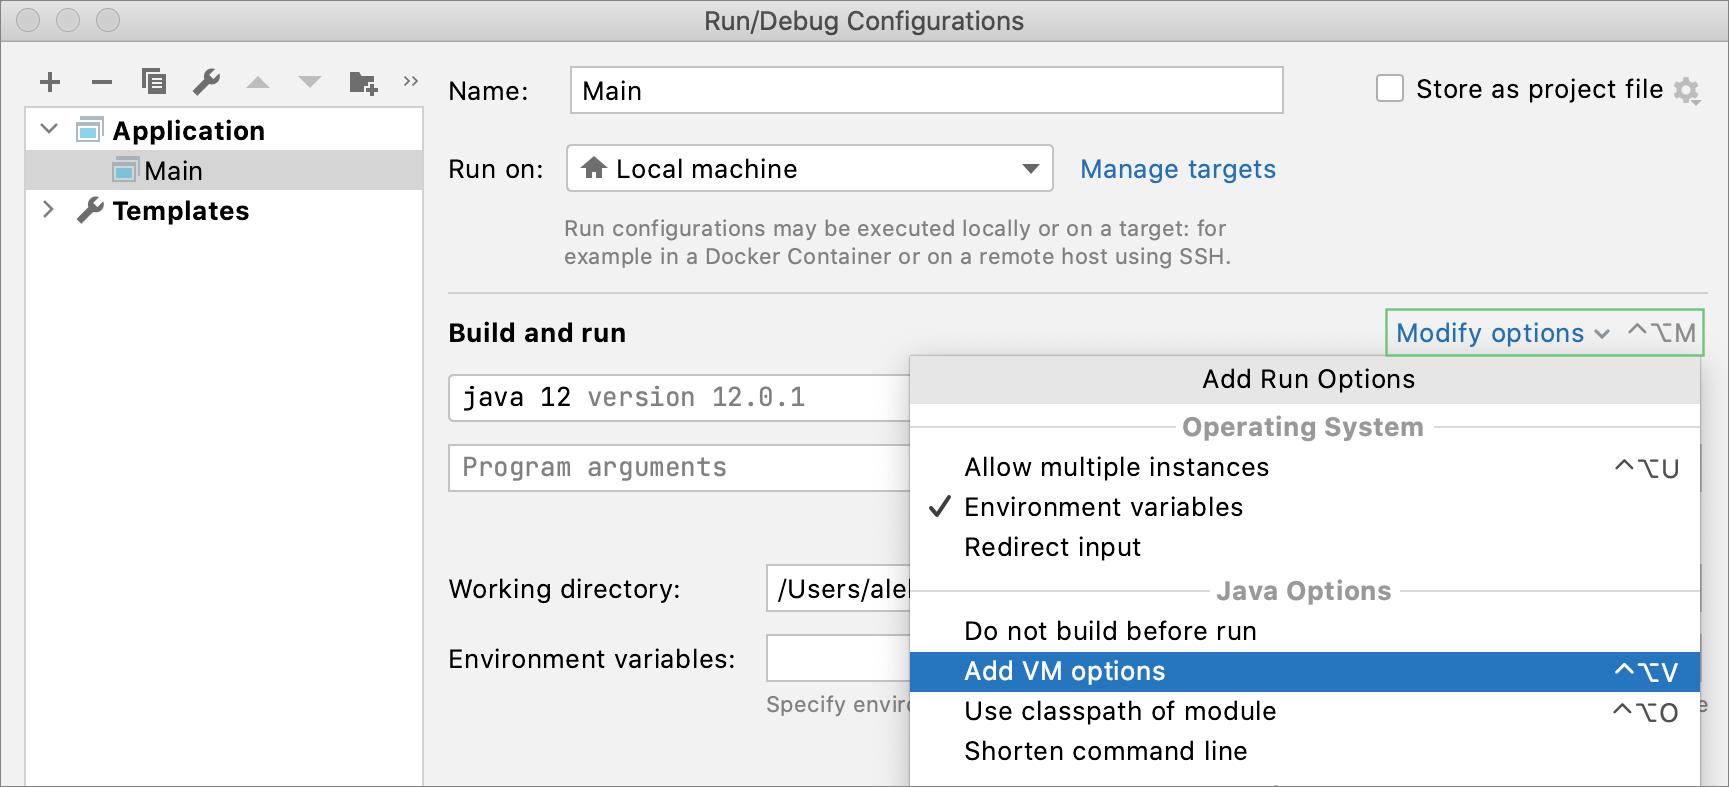 Adding the VM options field